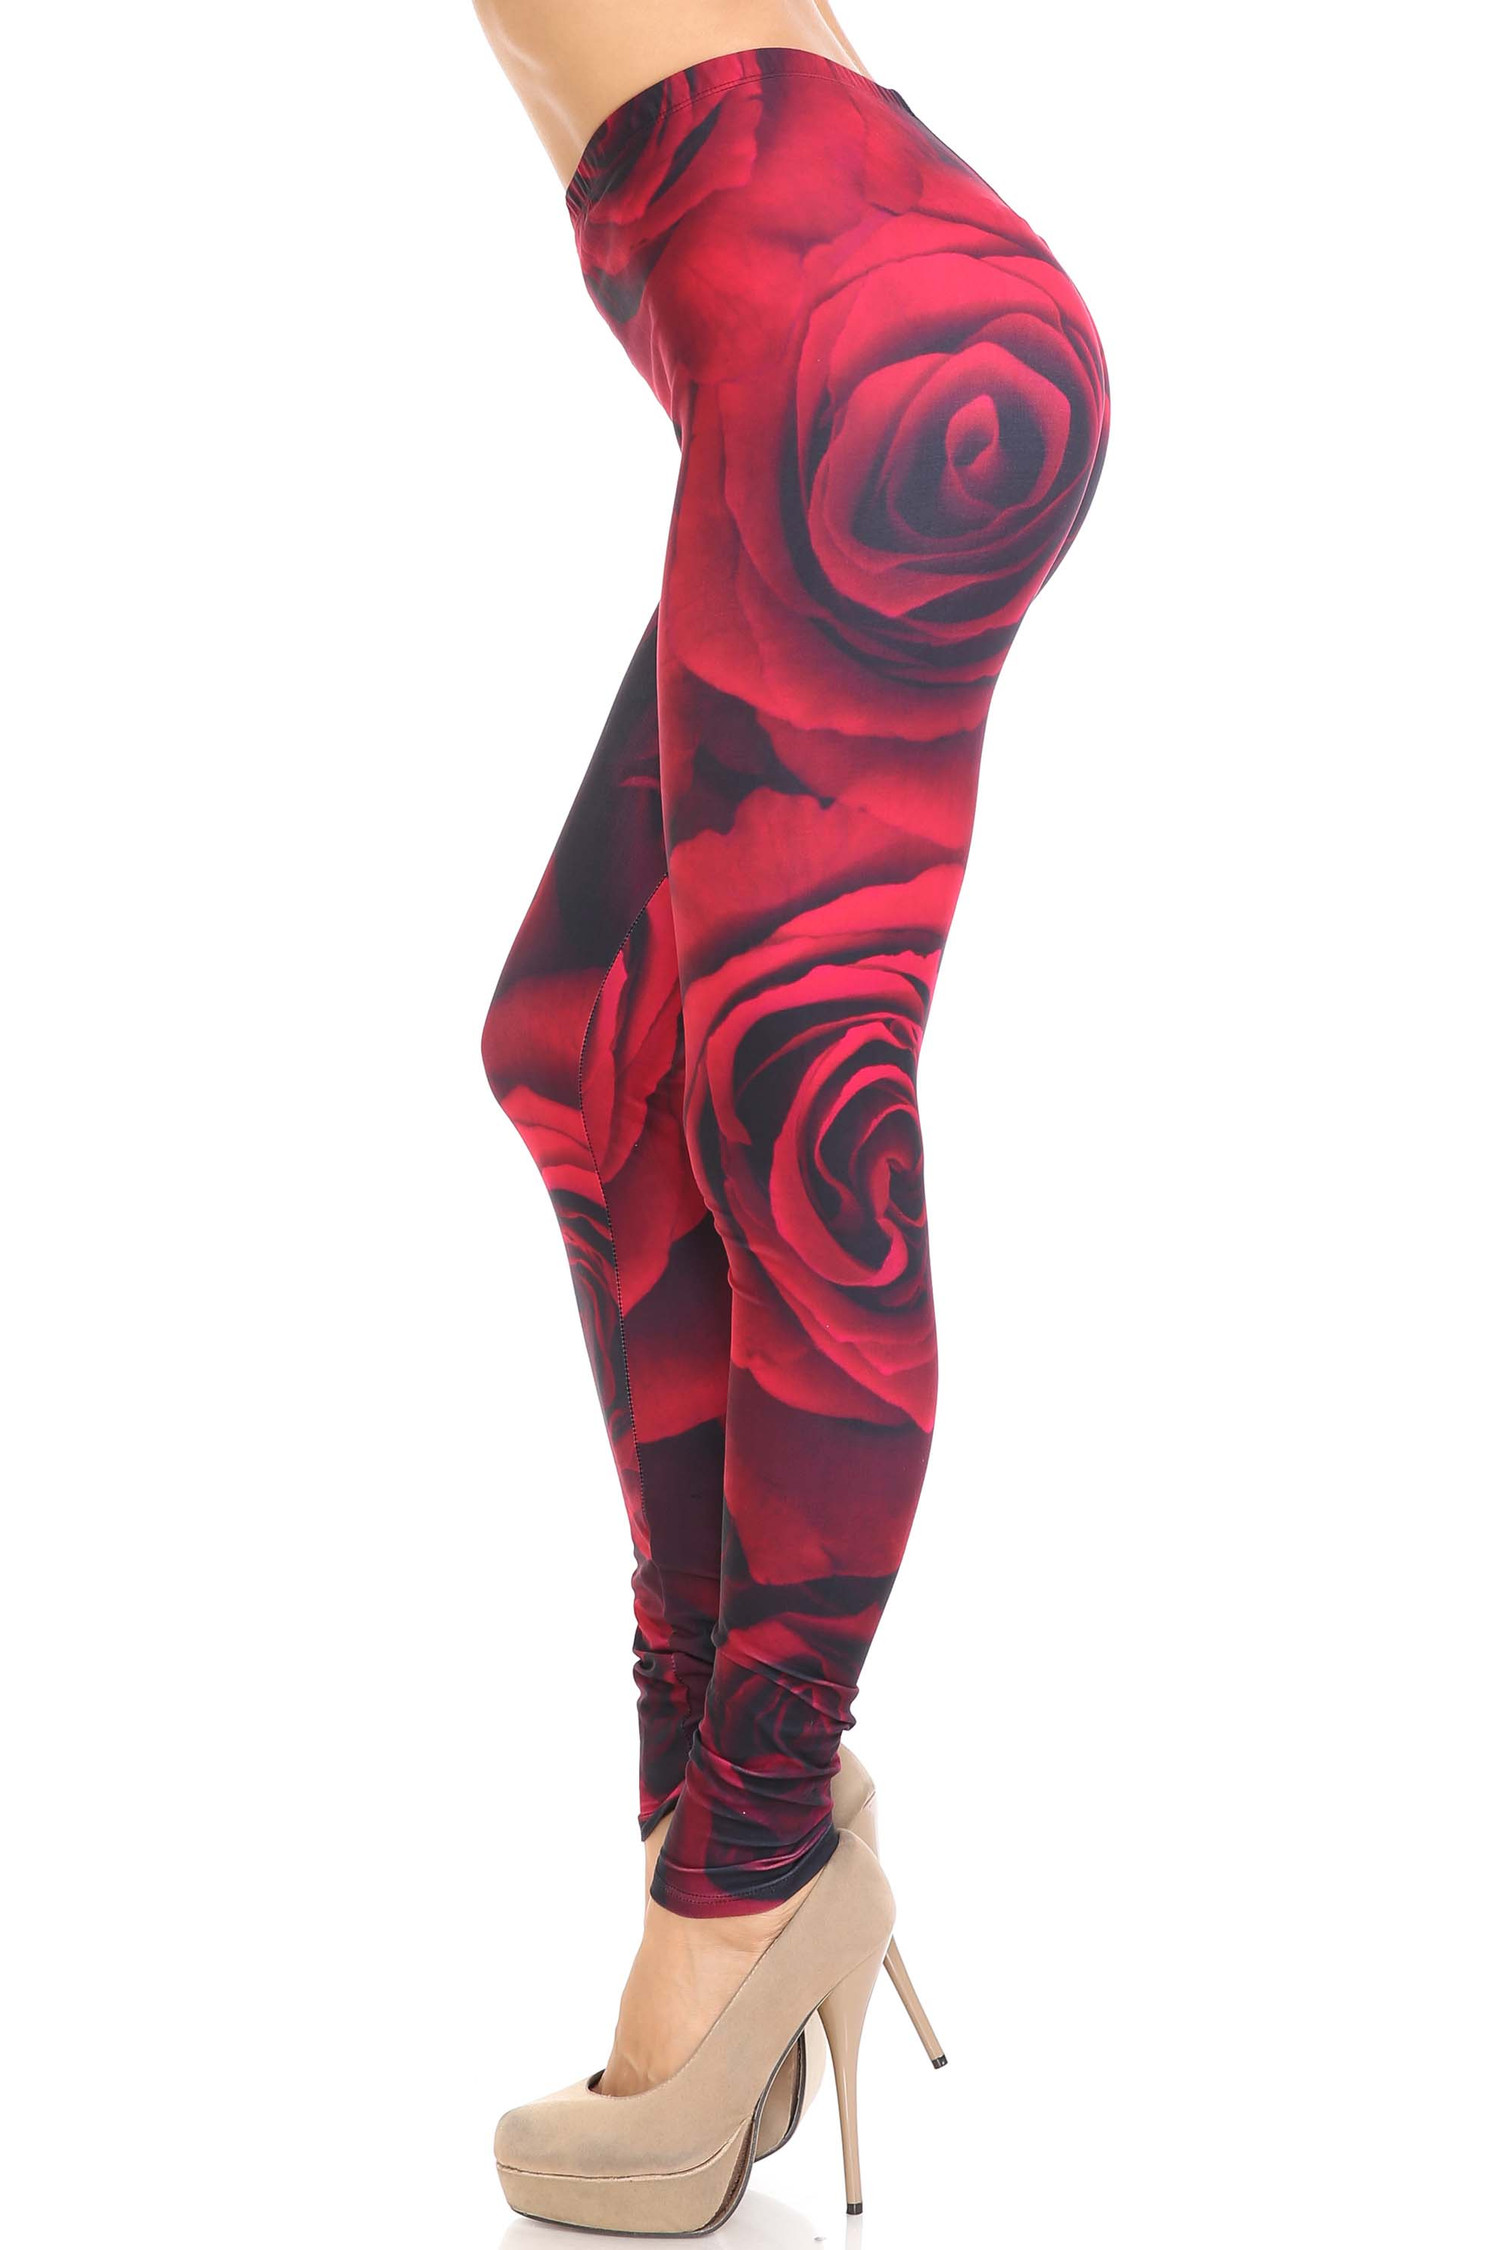 Creamy Soft Jumbo Red Rose Extra Plus Size Leggings - 3X-5X - USA Fashion™